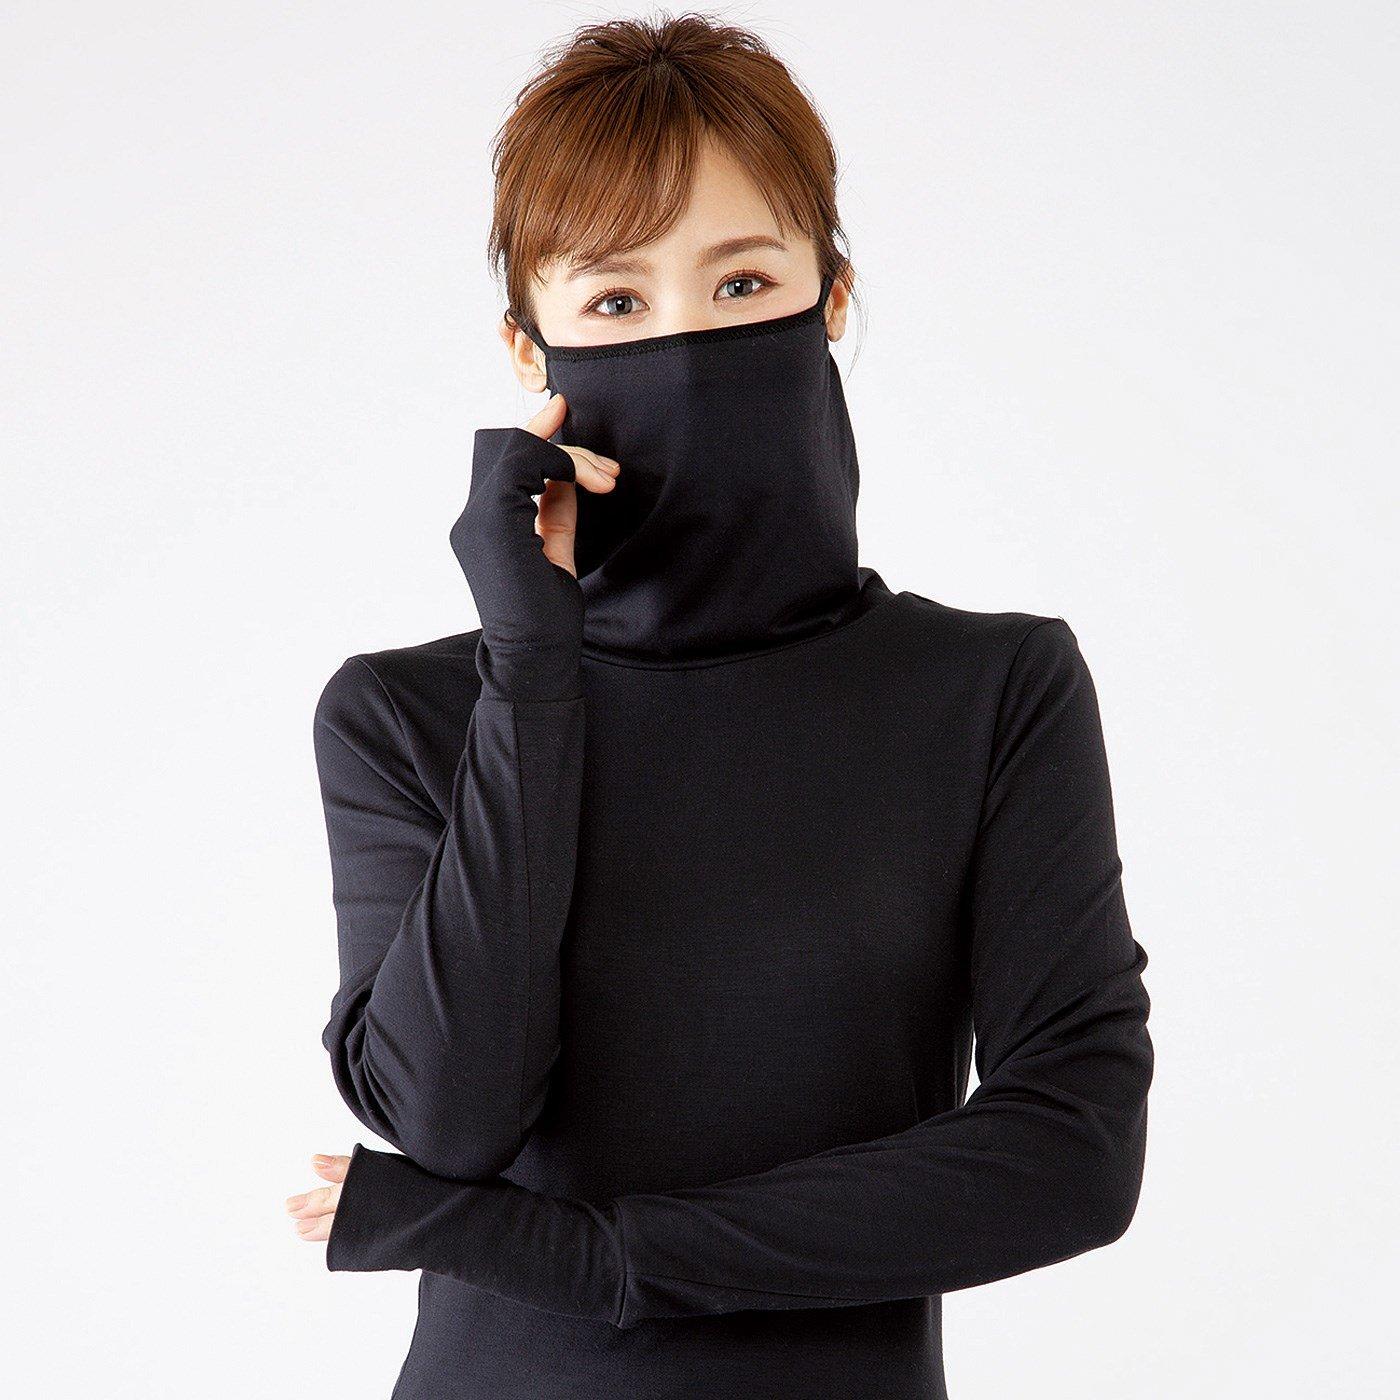 Up.de 吸湿発熱素材で着るだけ簡単防寒対策 ストレッチロングTシャツ